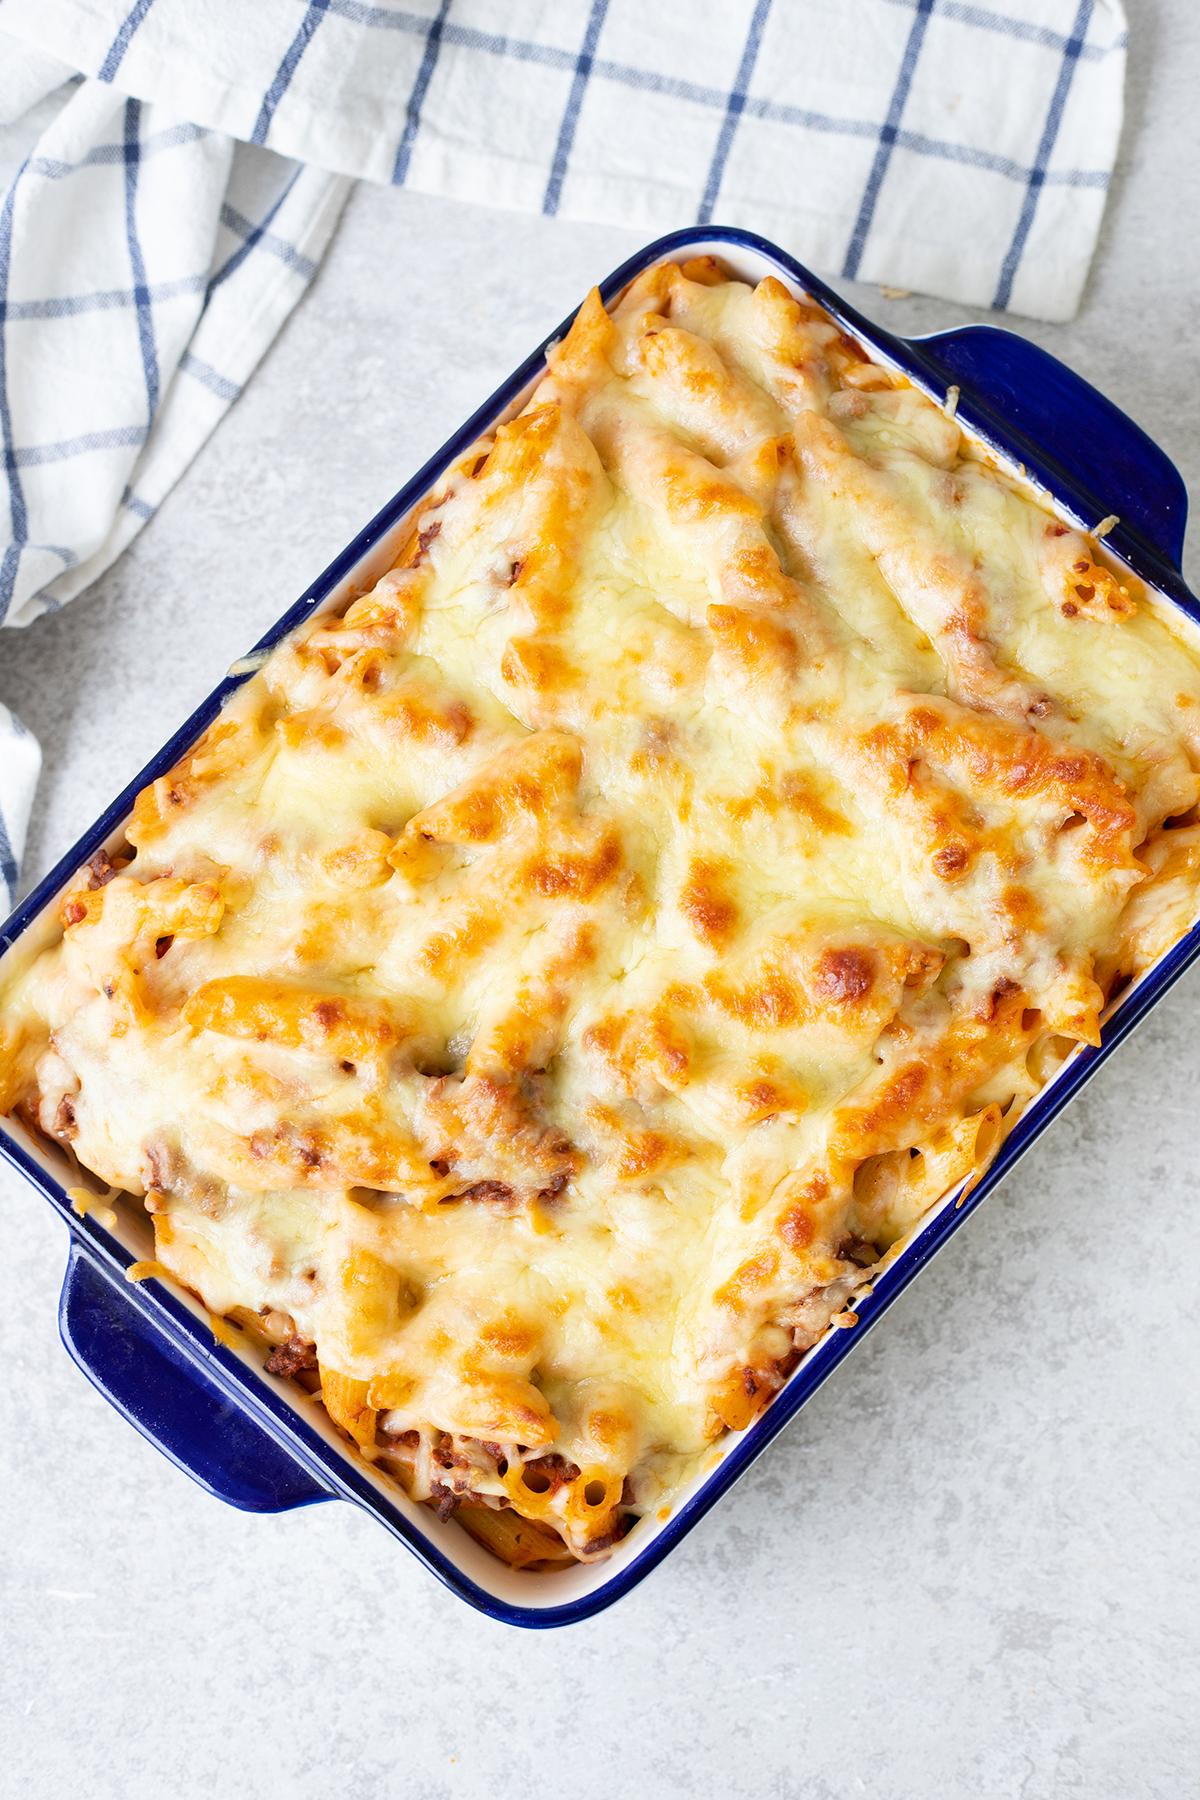 Pasta al Forno is a classic Italian baked pasta dish.